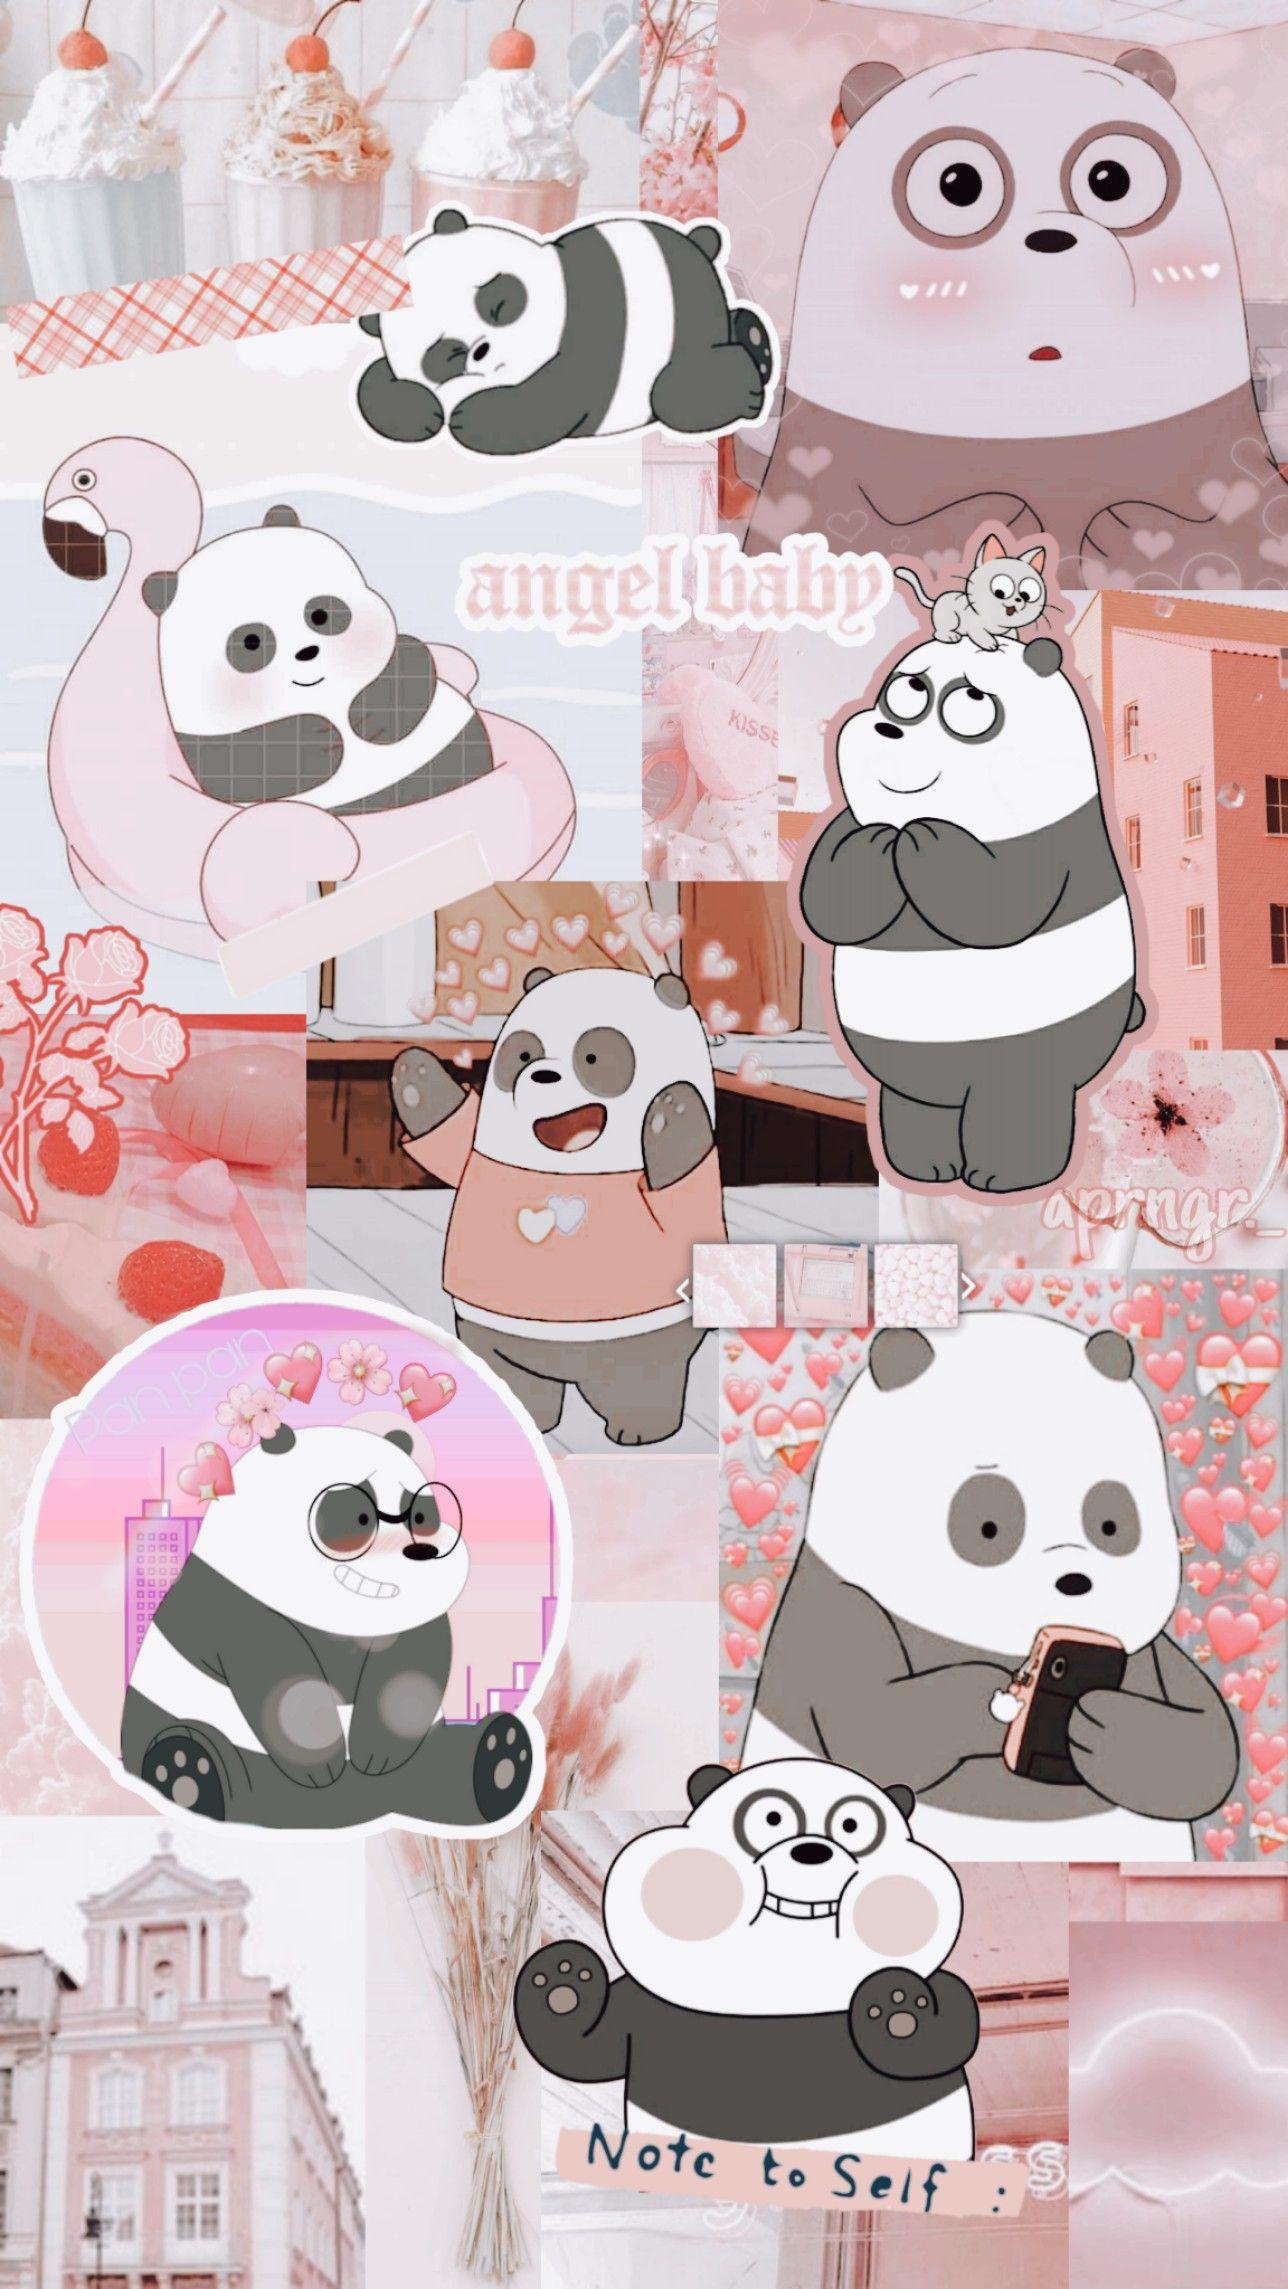 Background Aesthatic Webebear Panda Lockscreen Pink Wallpaper Cartoon Net Boneka Hewan Anak Binatang Seni Kartun